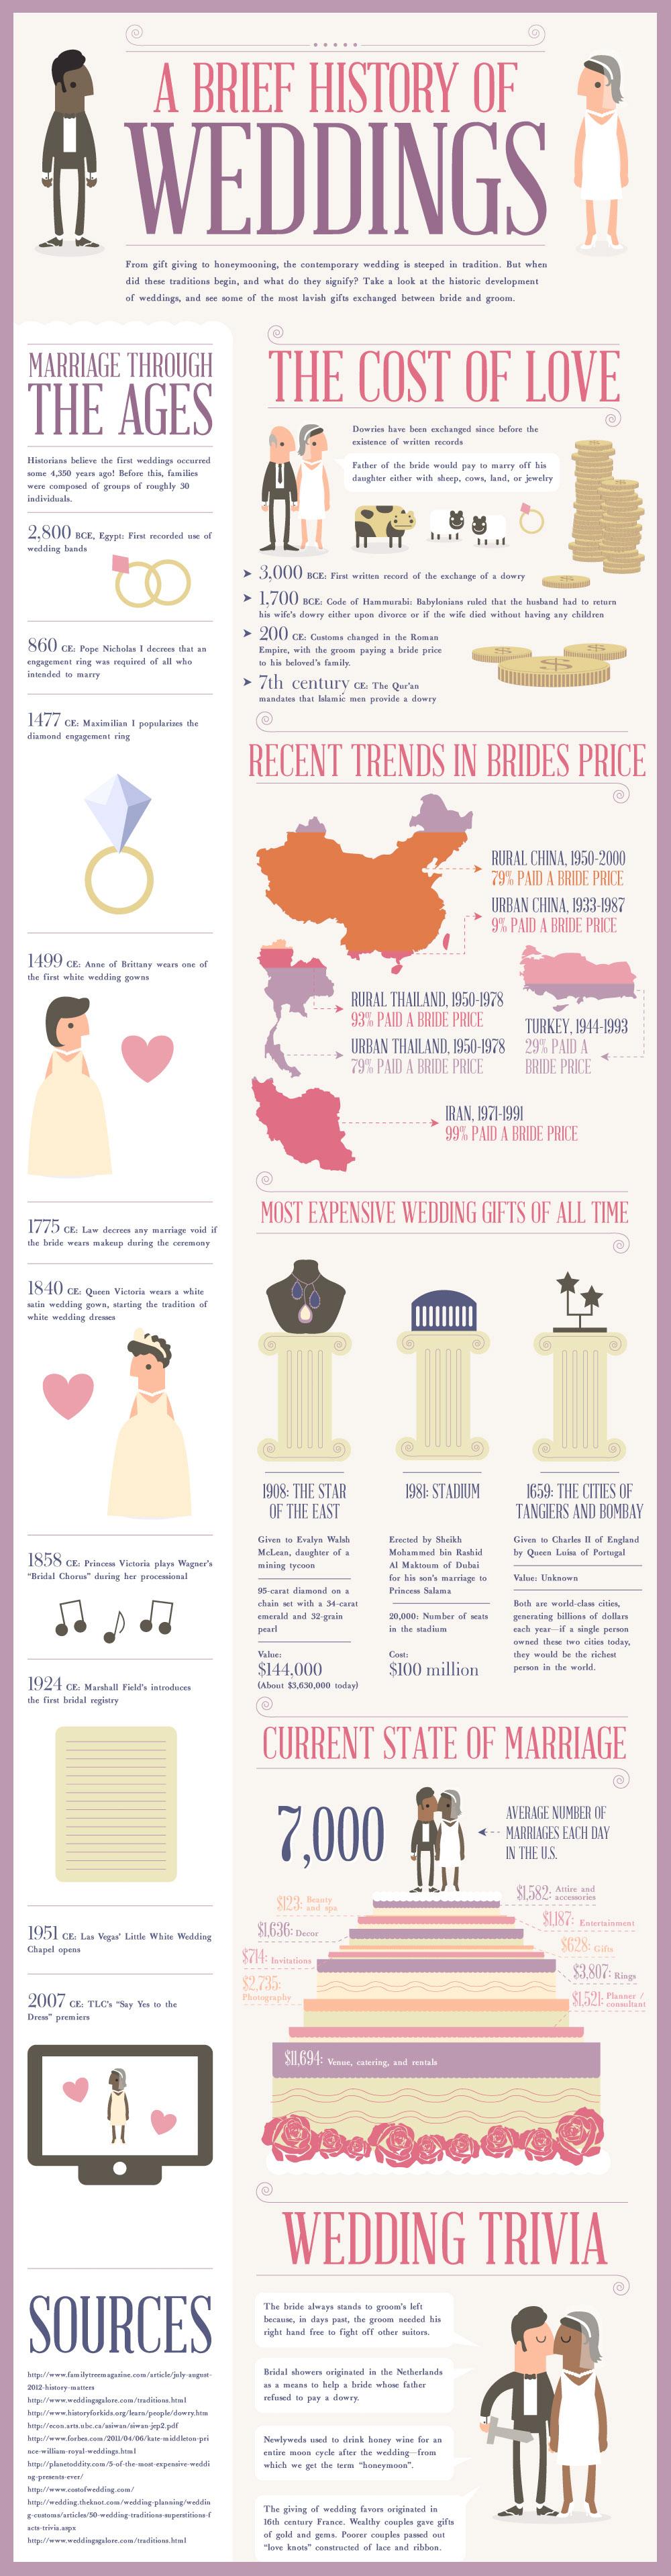 Weddings Etiquette-Infographic